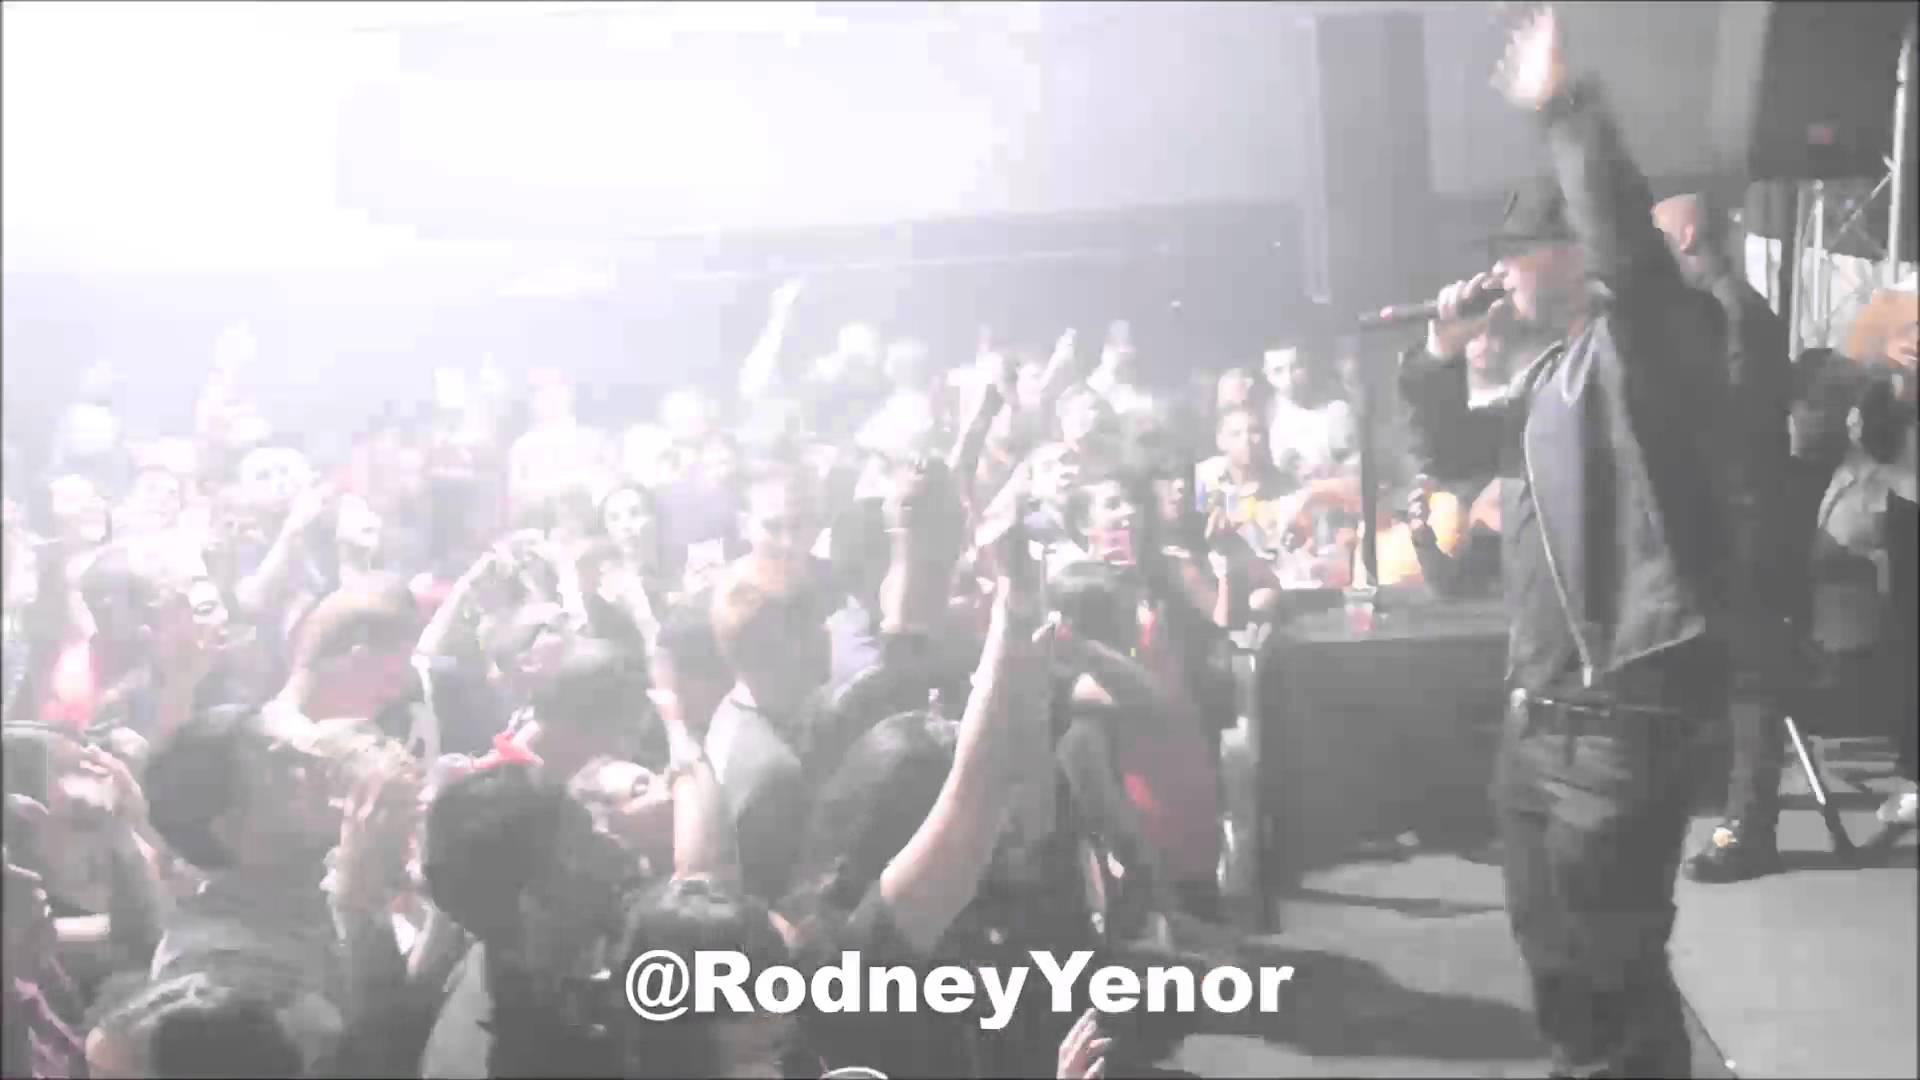 farruko lejos de aqui club krono - Farruko -- Si No Te Quiere Remix (Club Kronos) (2016)